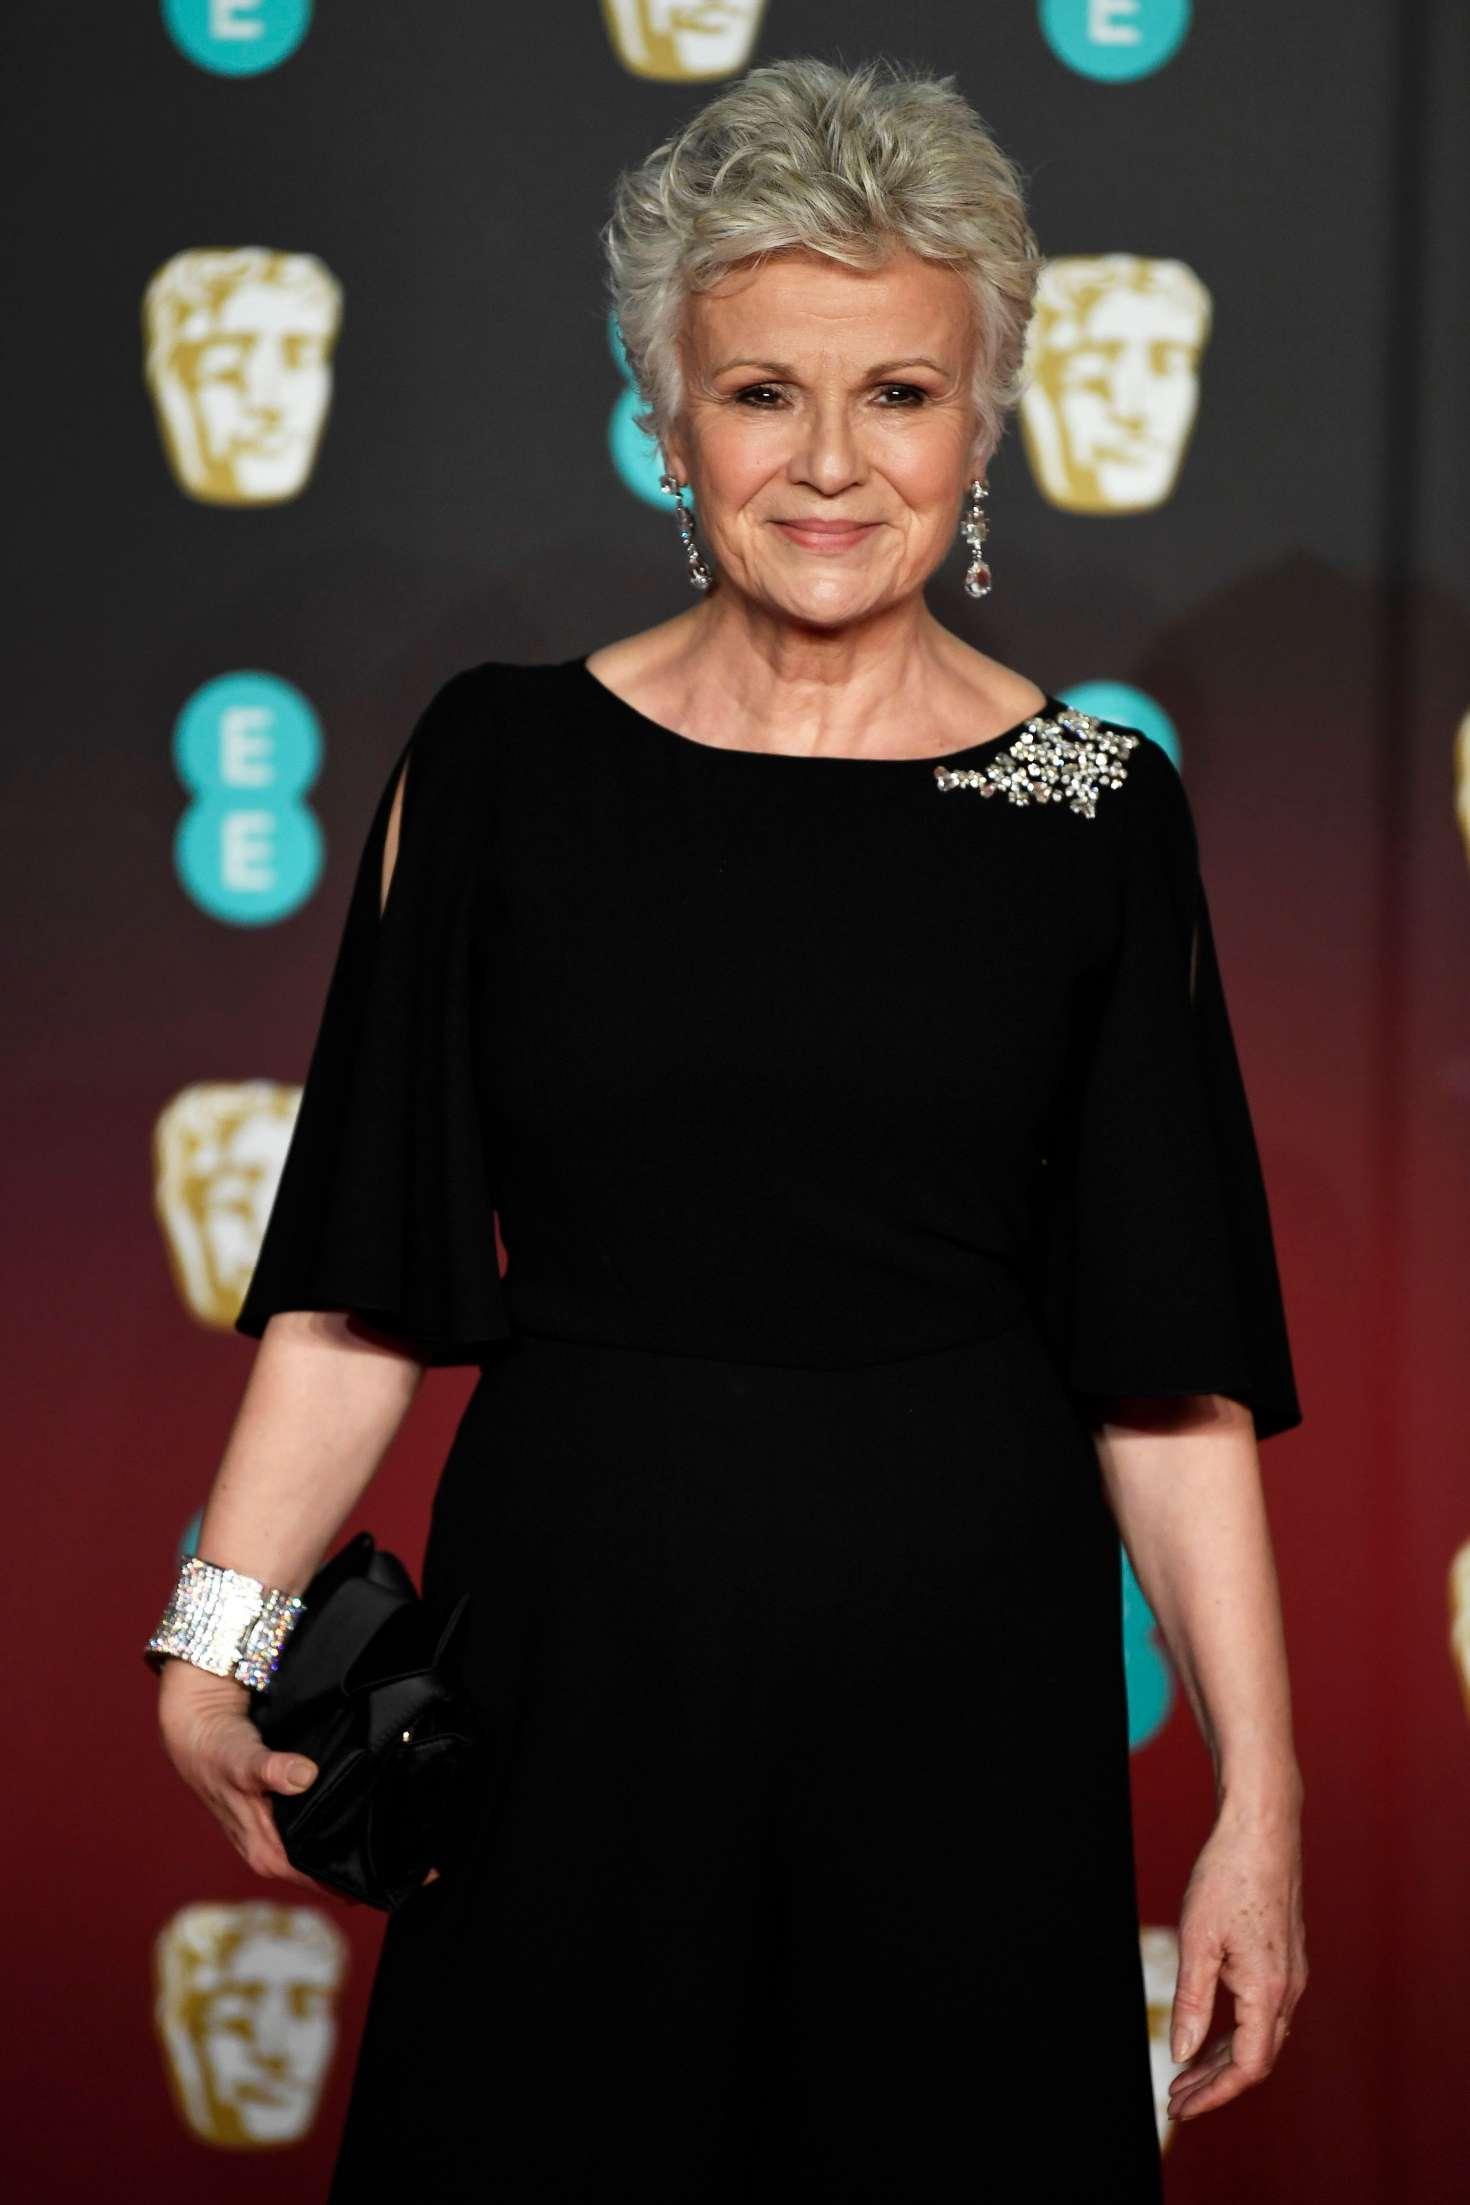 Julie Walters 71st British Academy Film Awards In London